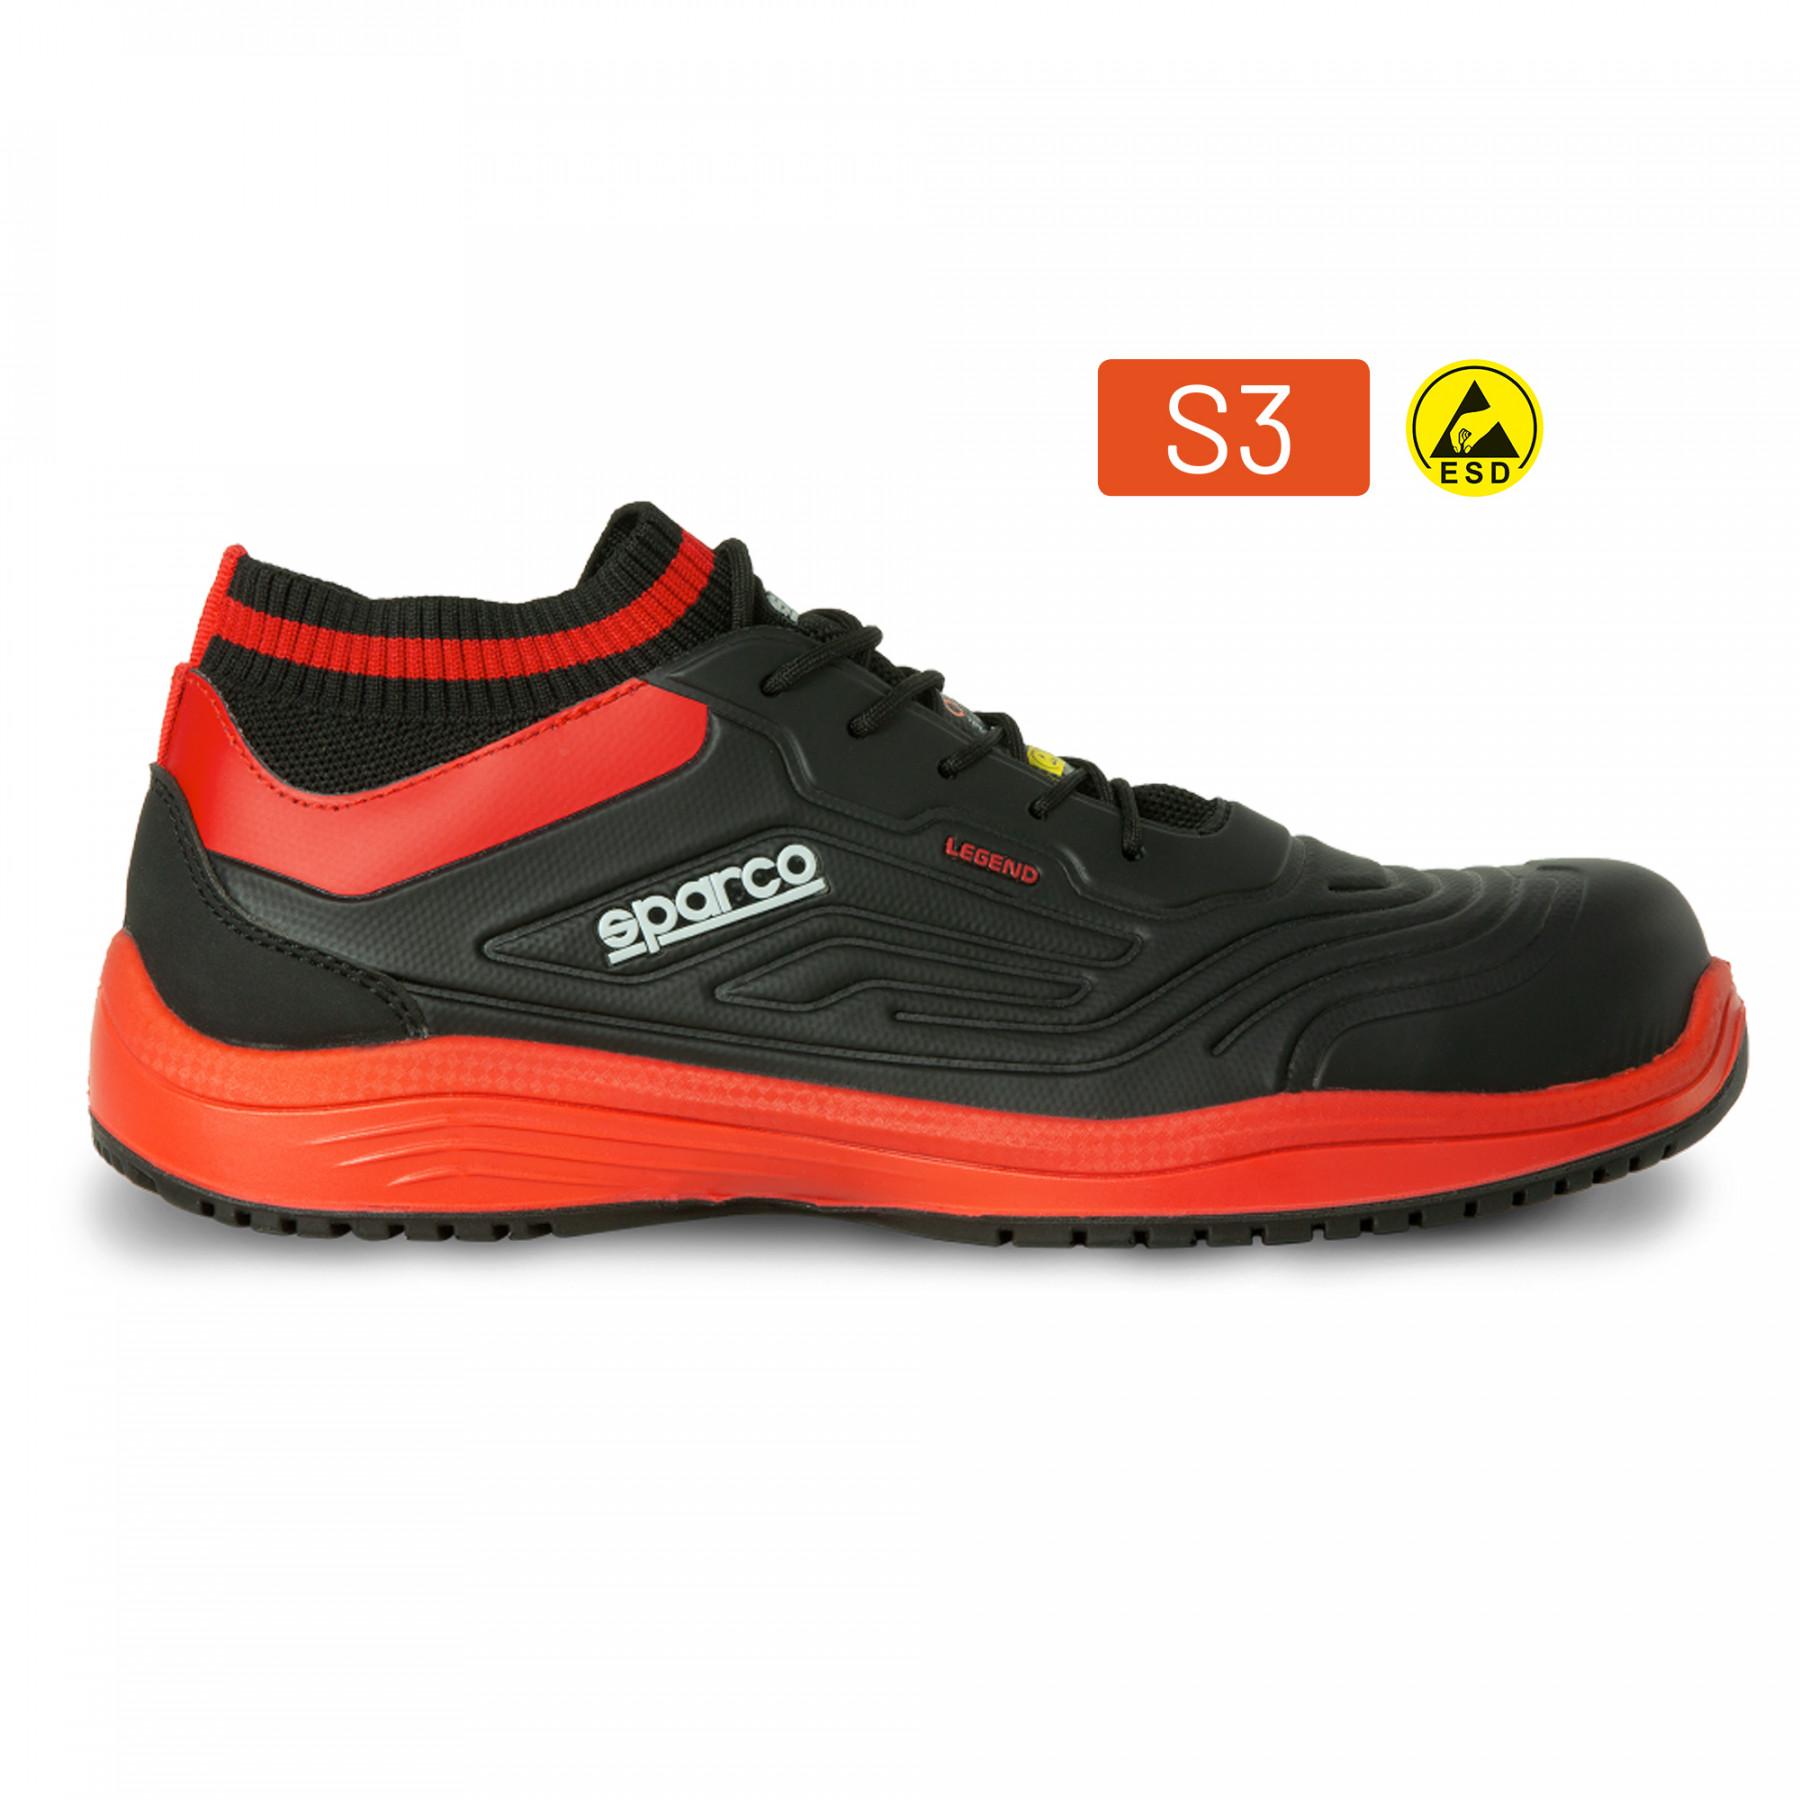 SHOE LEGEND S3 ESD BLACK/RED S